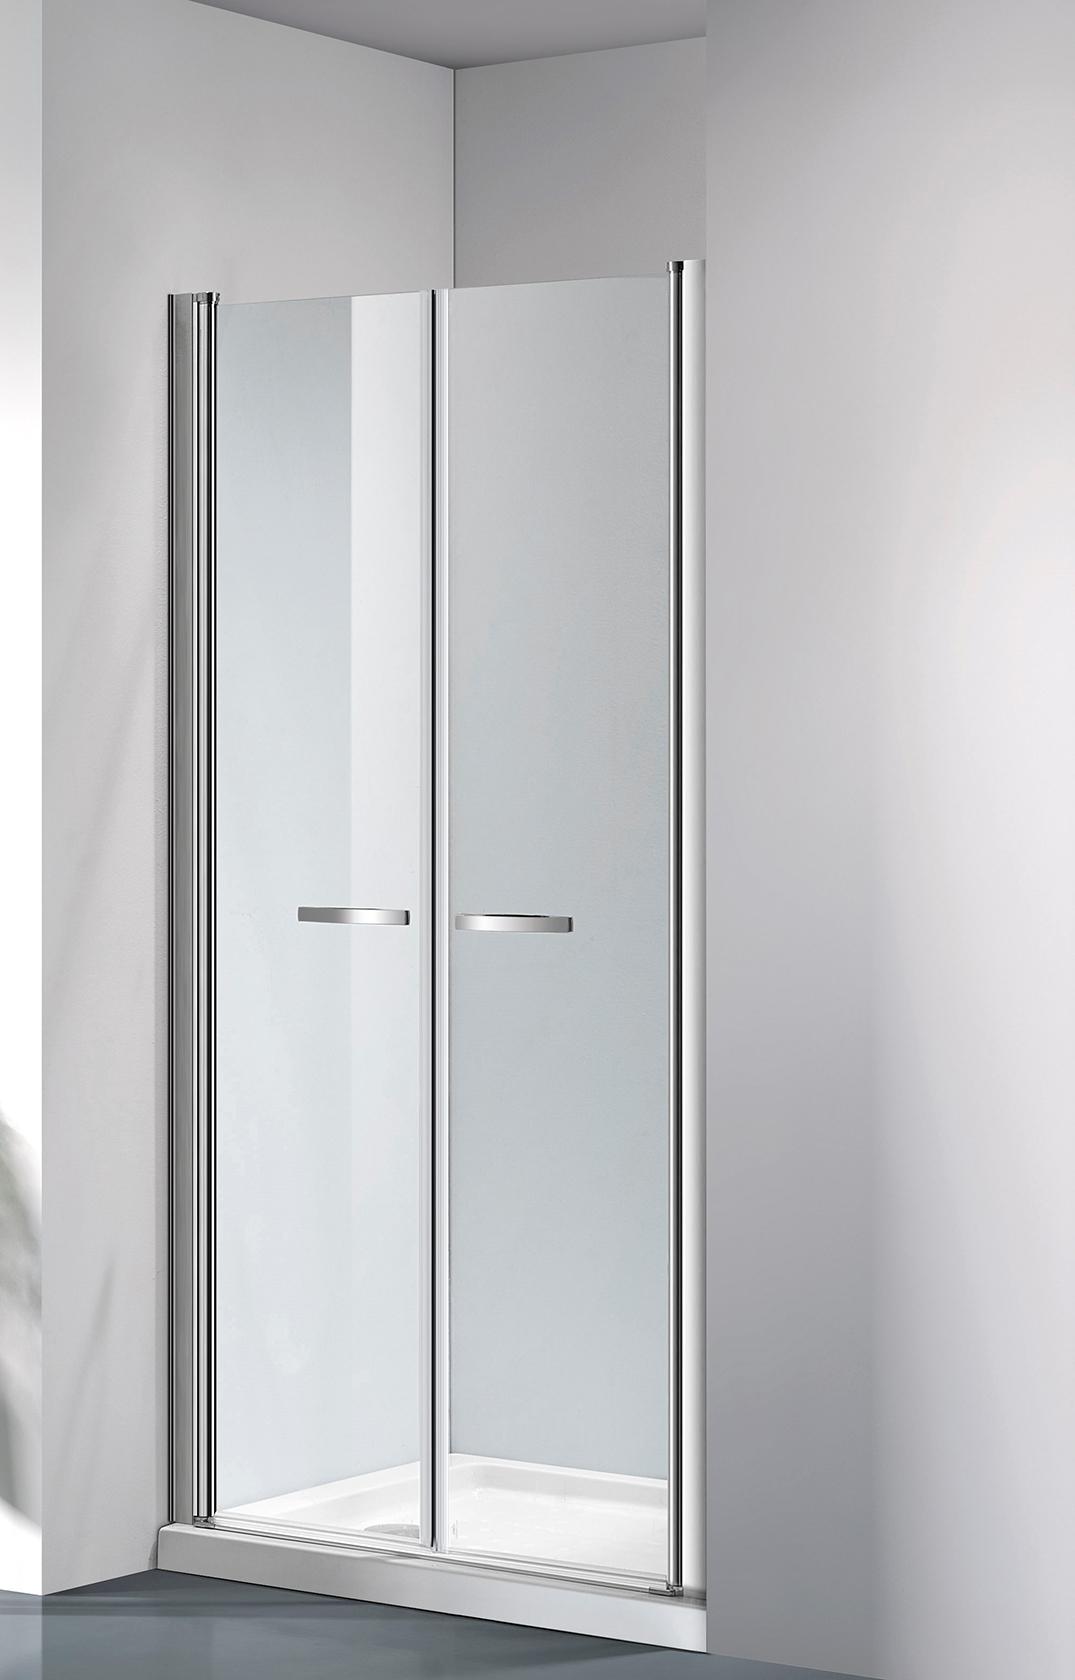 ARTTEC COMFORT 71-76 grape NEW - Sprchové dveře do niky